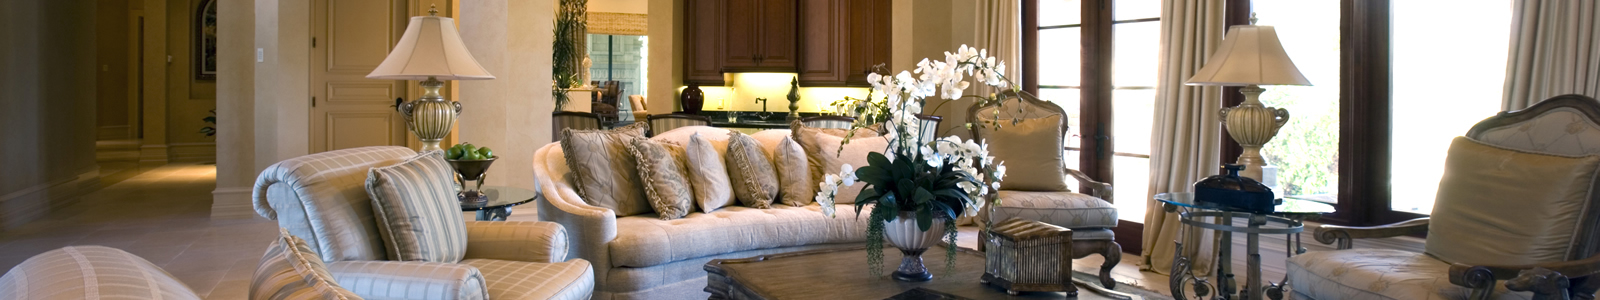 Vellore Village Luxury Upscale Properties